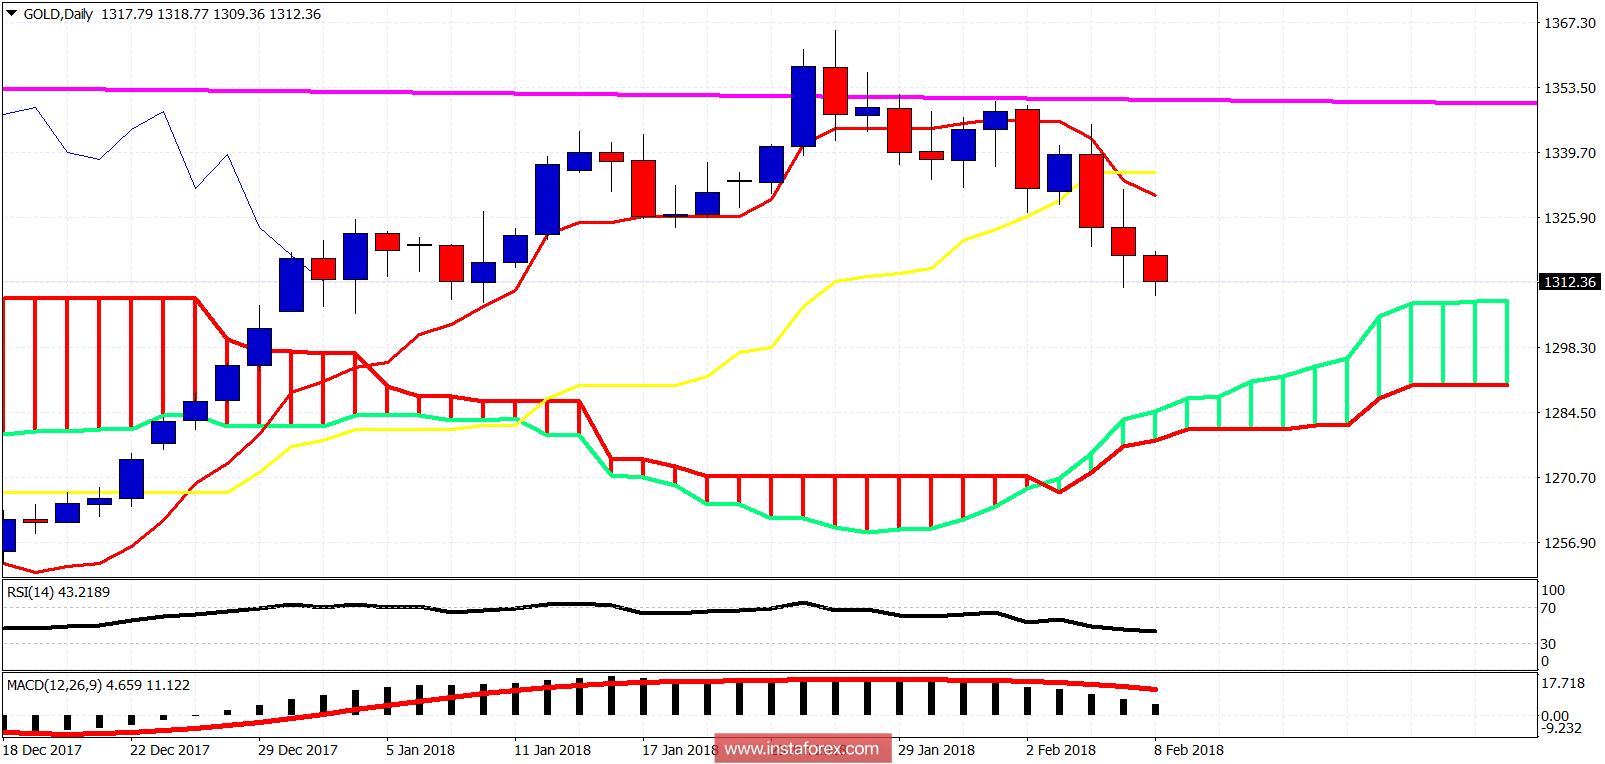 Ichimoku cloud indicator analysis of Gold for February 8, 2018